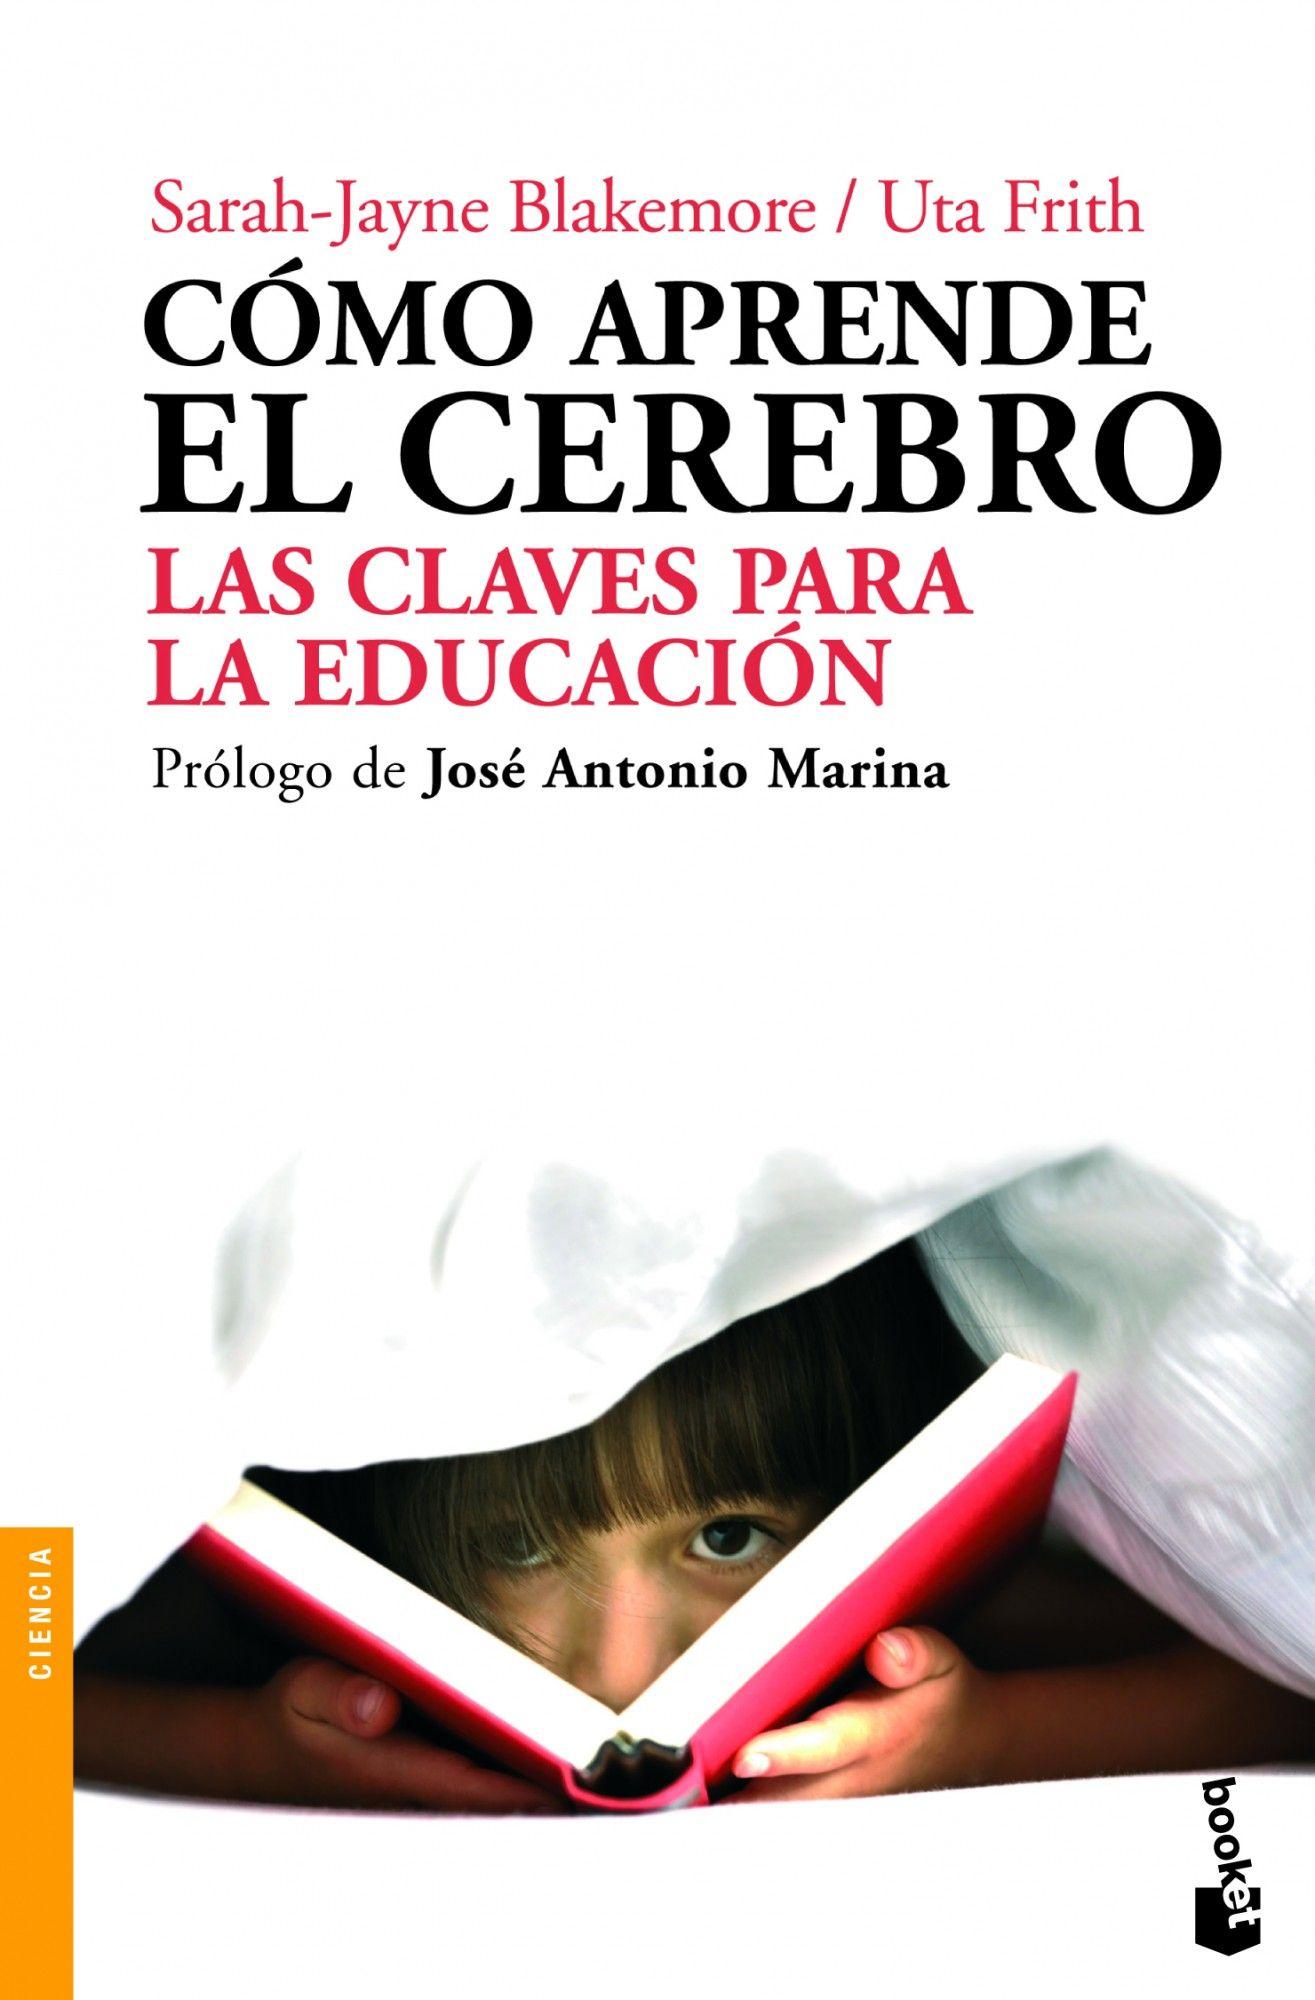 Diez Libros Imprescindibles Sobre Neuroeducación Neurociencia Y Educacion Libros Sobre Educacion Educacion